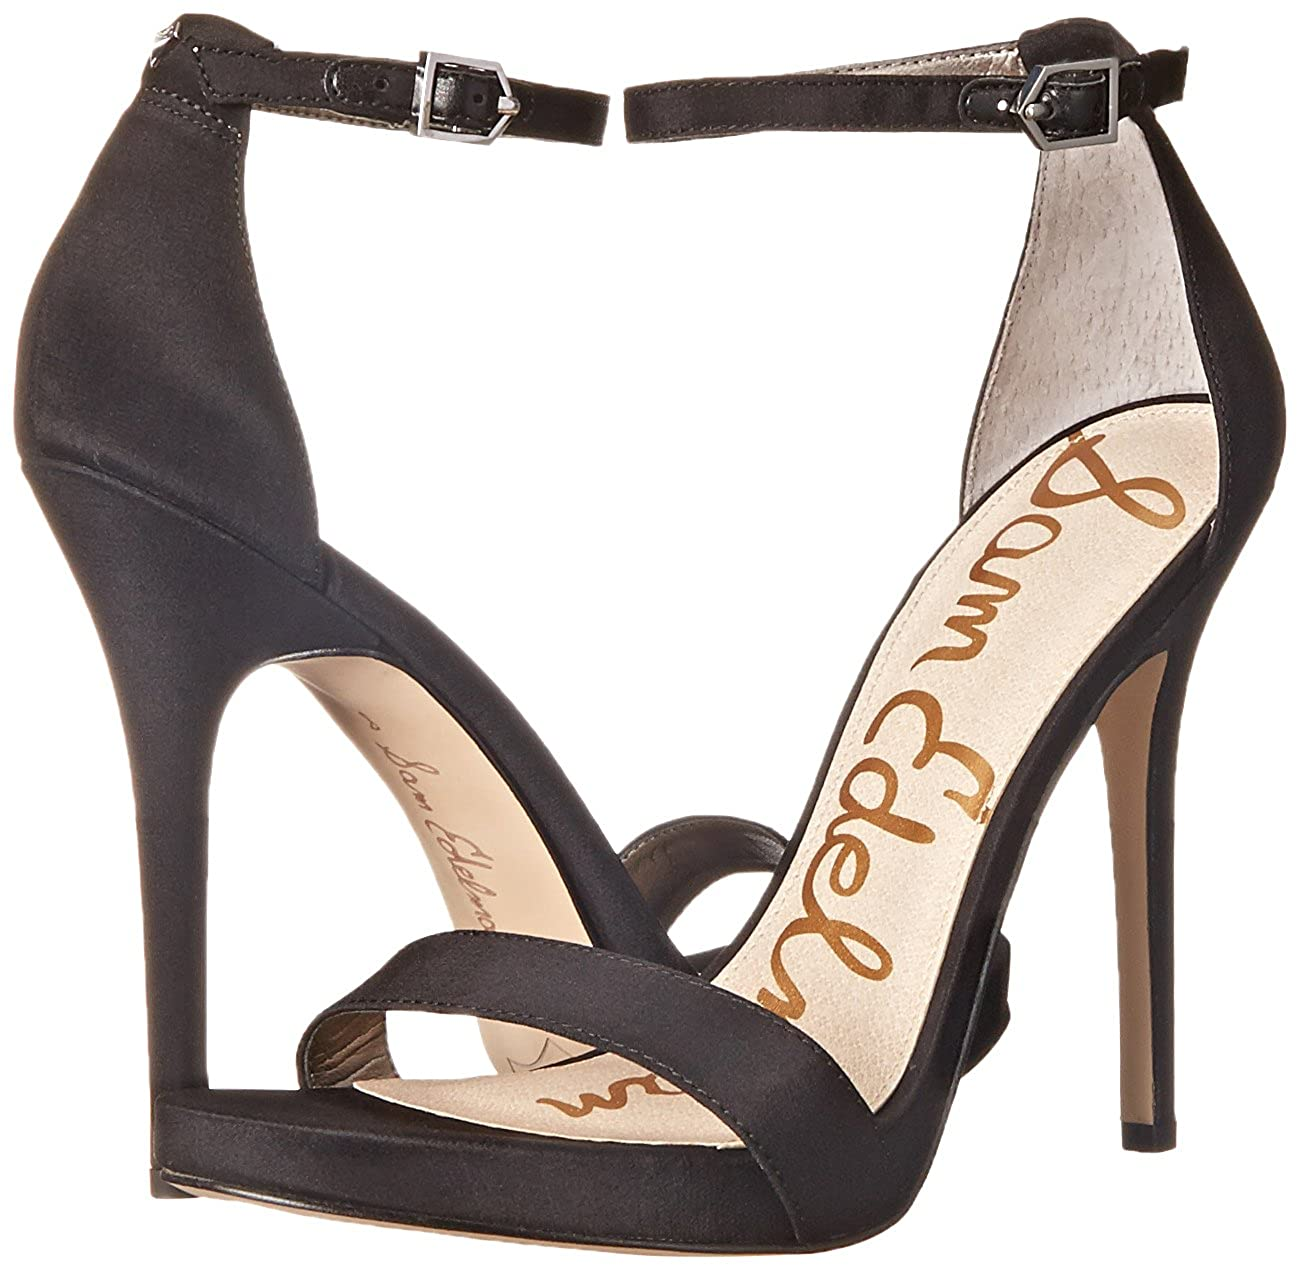 10056c674c0 Sam Edelman Women's Eleanor Dress Sandal: Amazon.ca: Shoes & Handbags